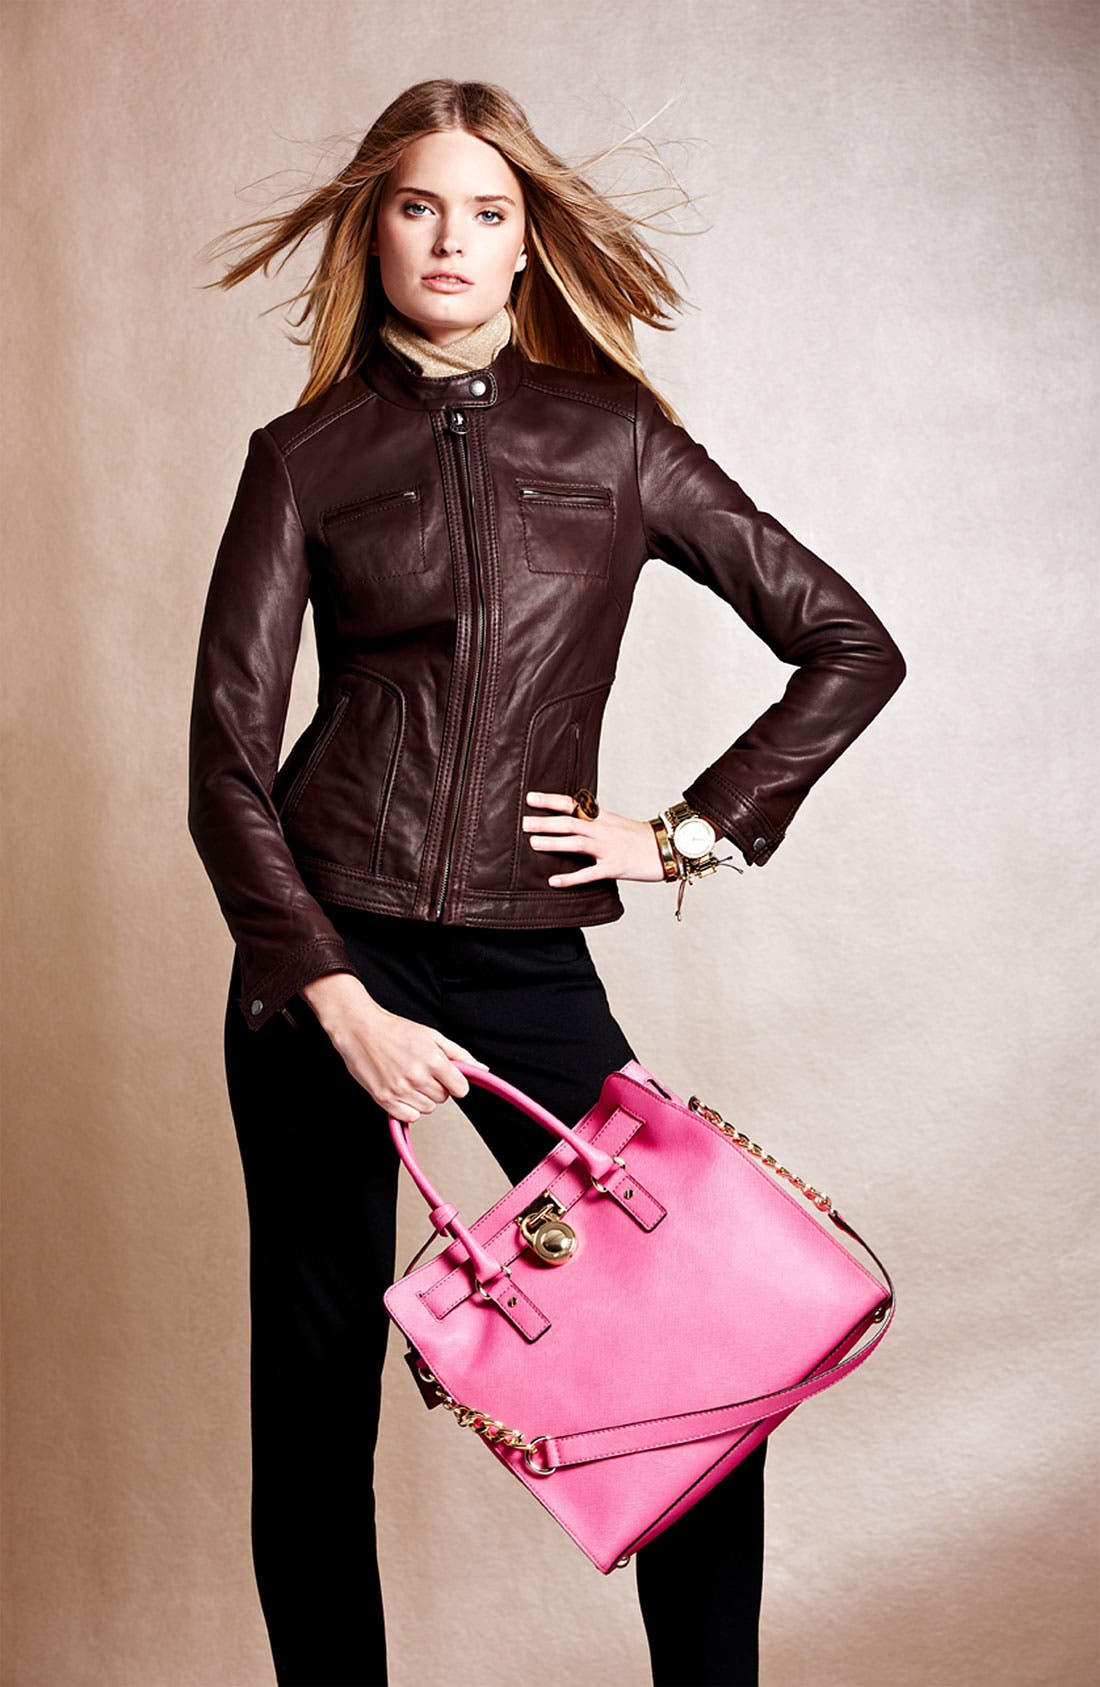 Alternate Image 1 Selected - MICHAEL Michael Kors Leather Jacket, Pants & Tote